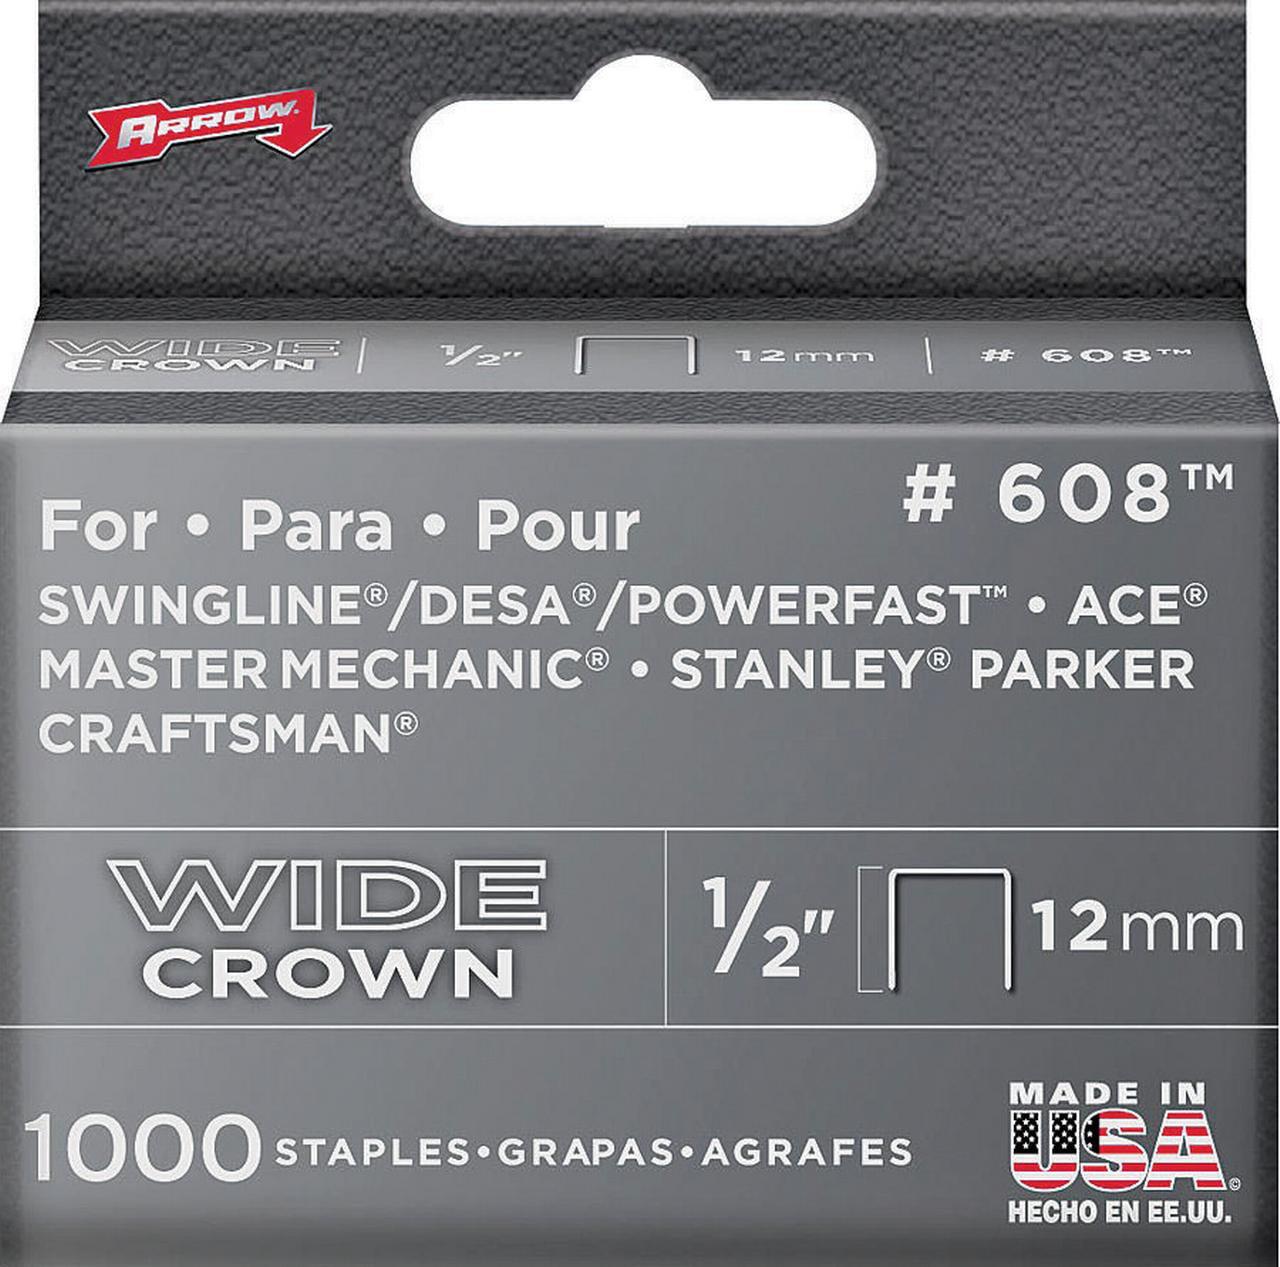 Arrow Fastener 60830 Staples, 600 Series, Wide Crown, 1 2 Inch by Arrow Fastener